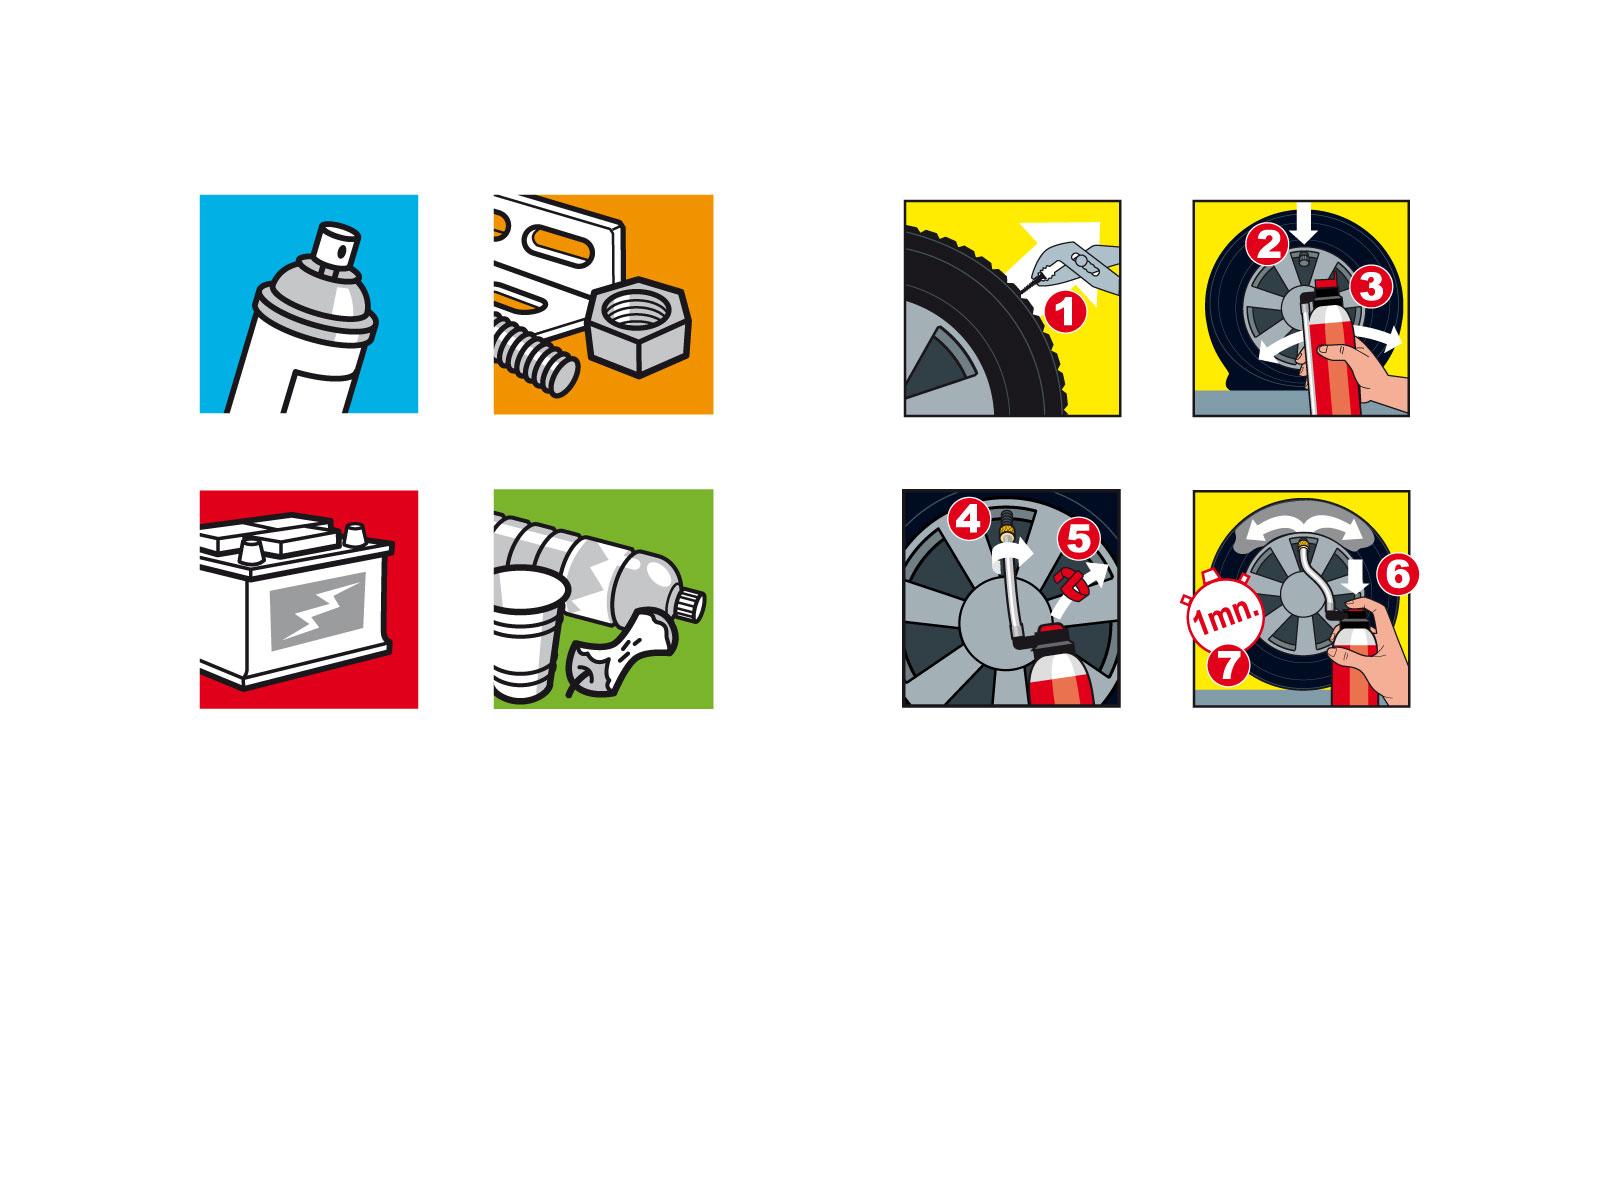 ERICK-Illustrations-VIGNETTES PICTOS-2726